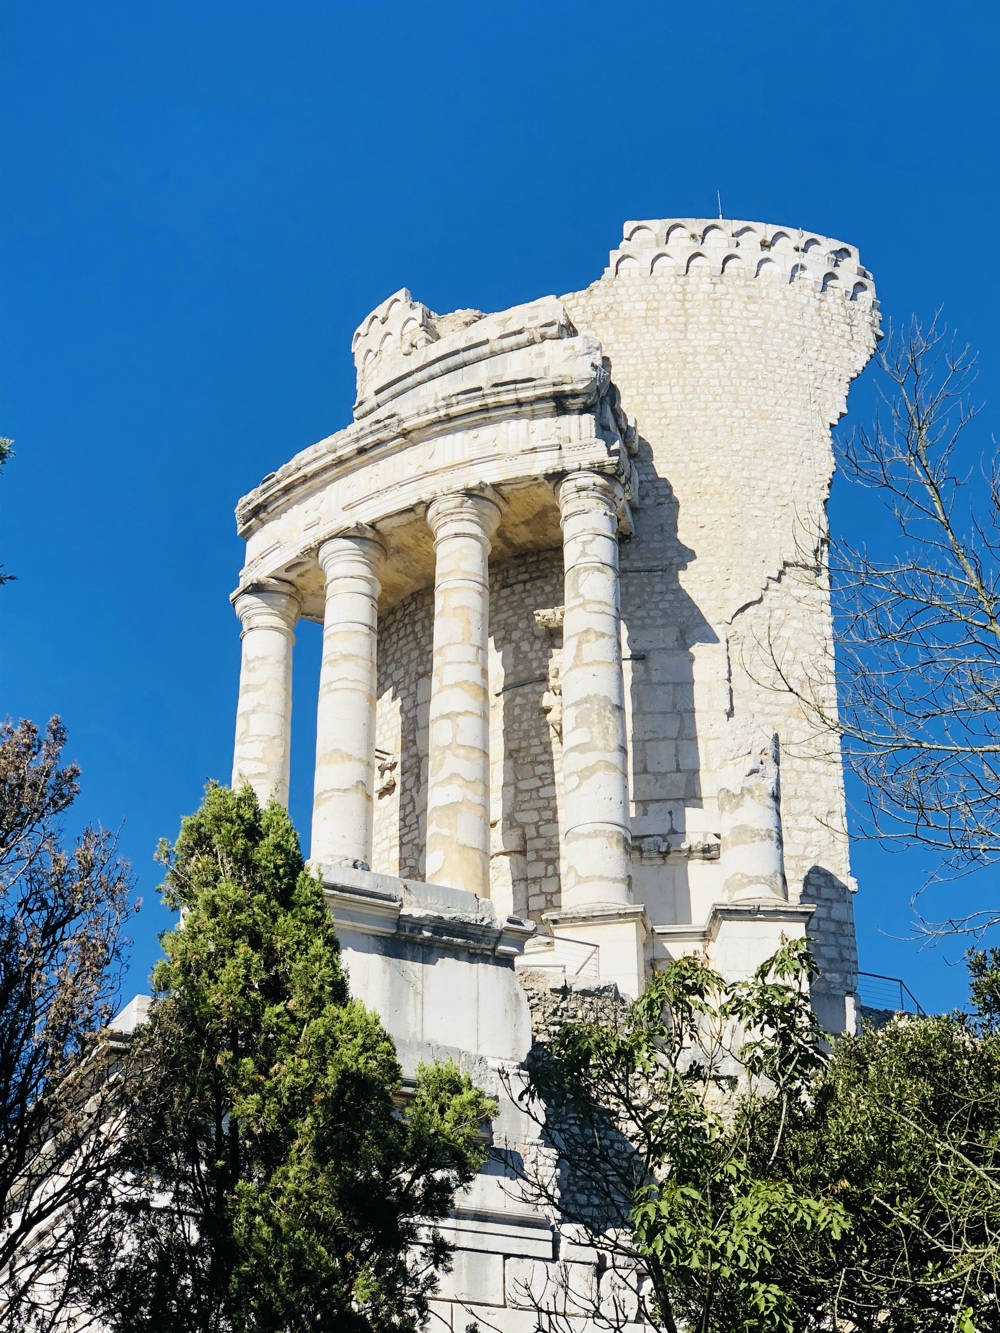 Ruins in La Turbie